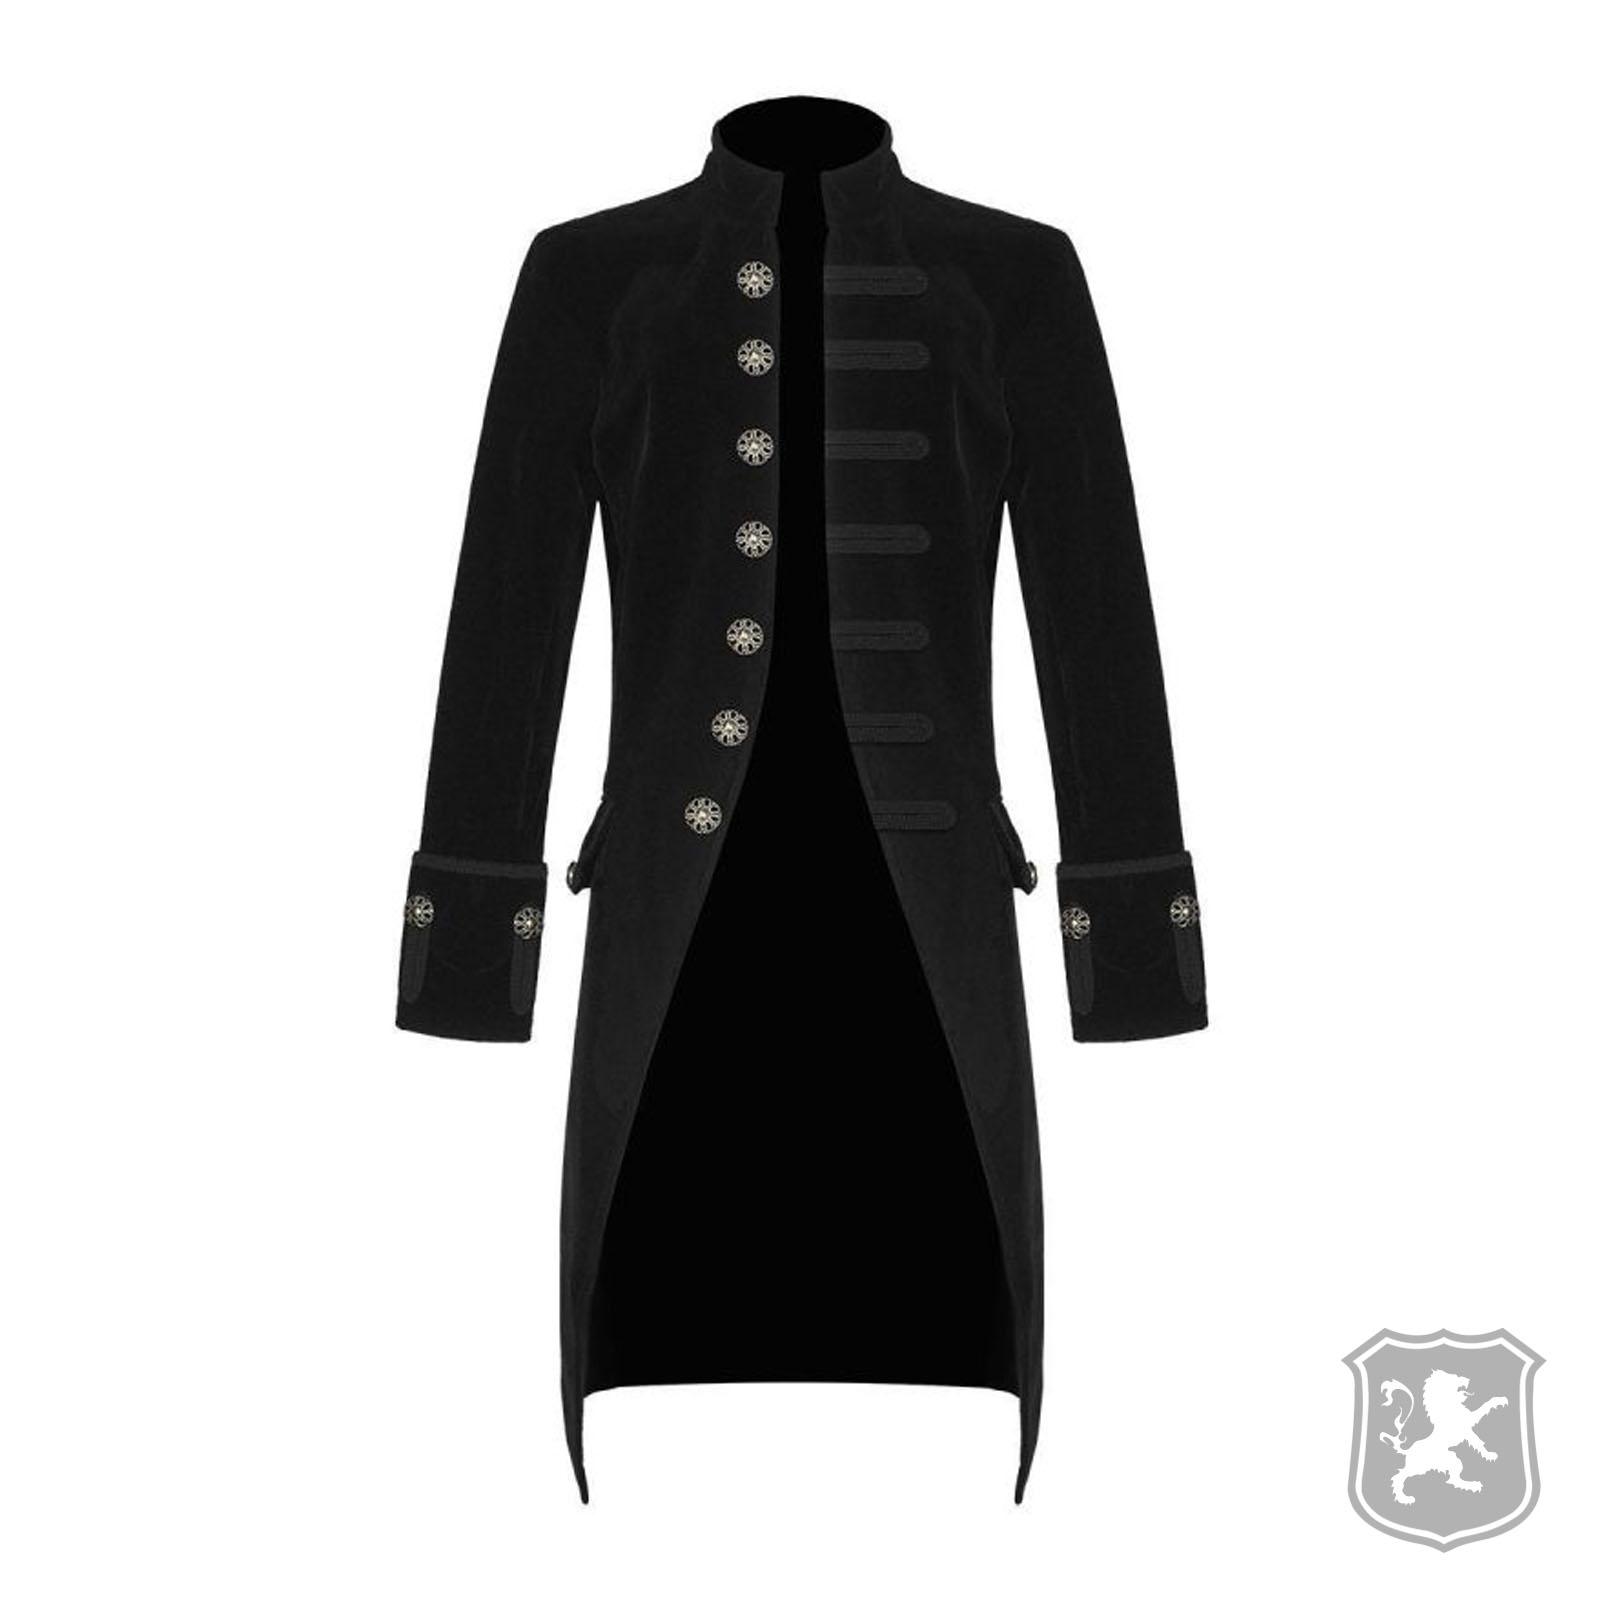 39c727f45ea4 gothic jackets, gothic, goth, goth jackets, goth jacket, jackets for sale